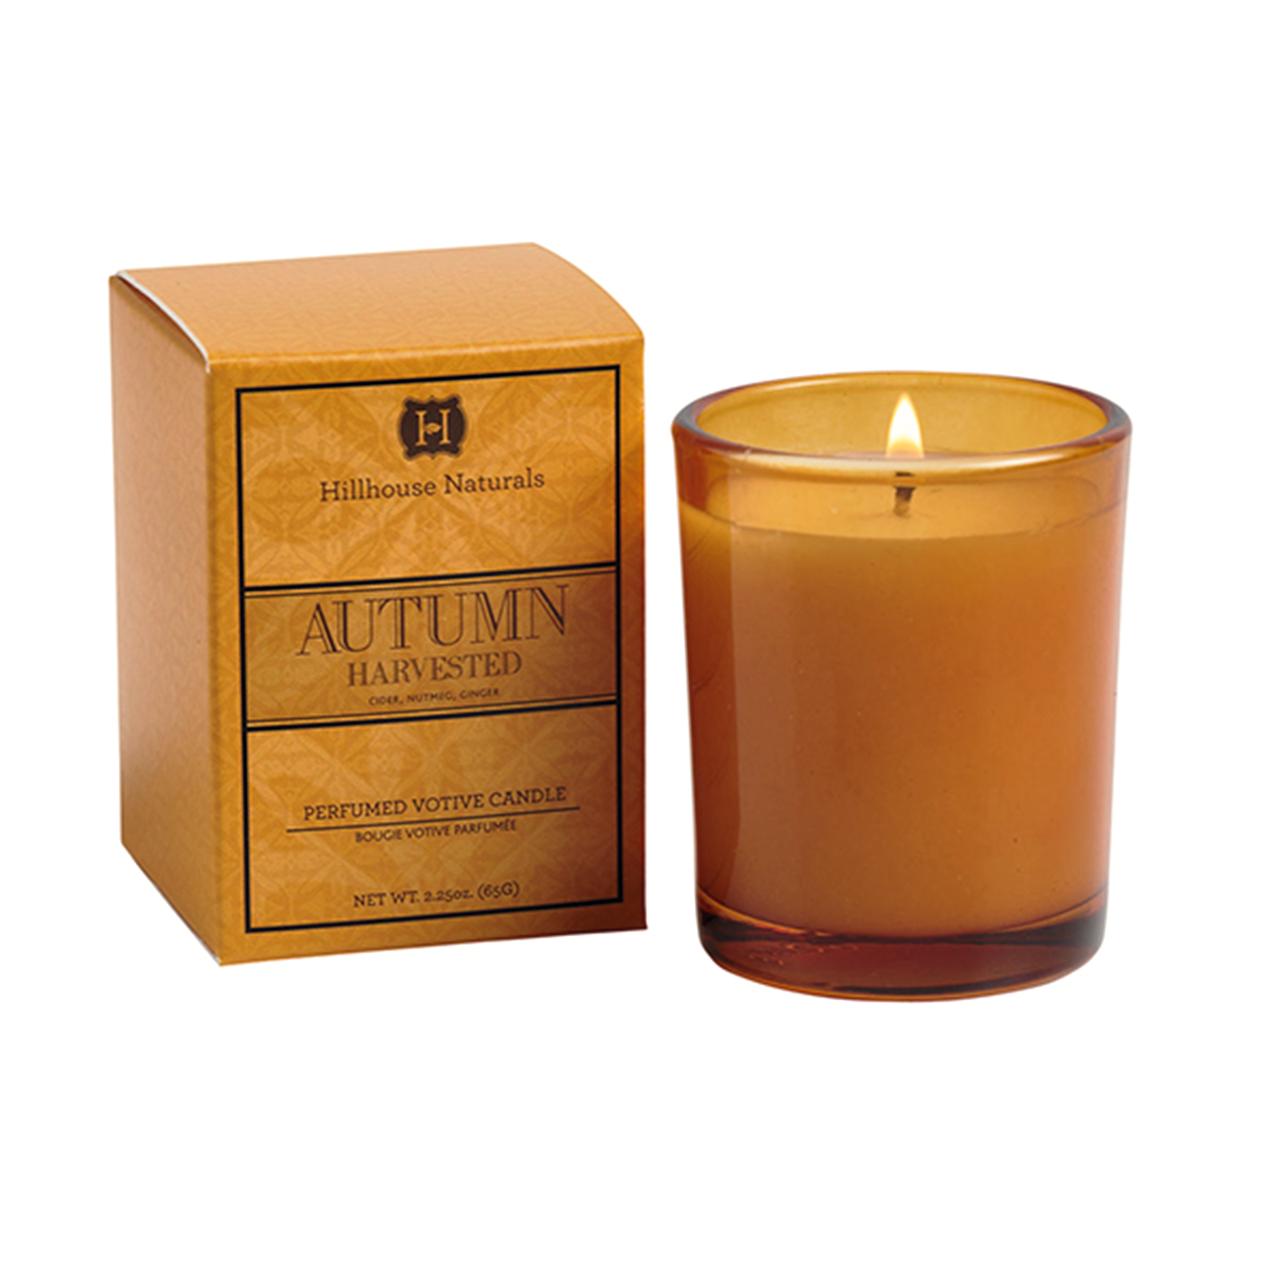 Hillhouse Naturals Autumn Harvested Votive Glass Candle